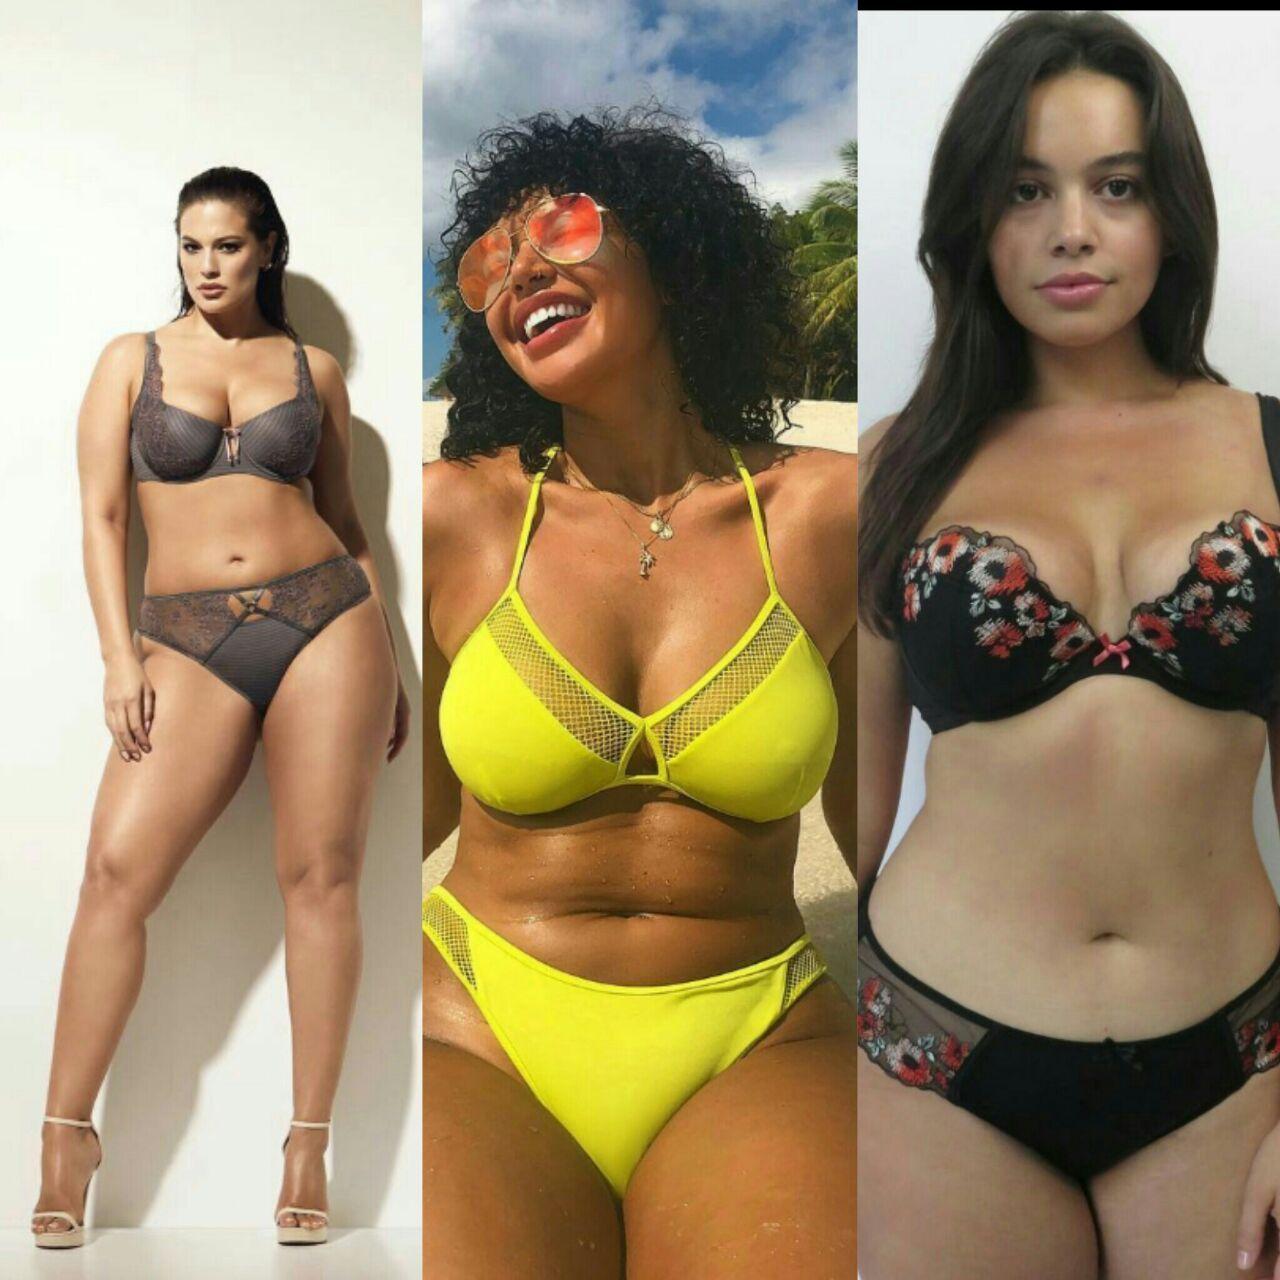 Plus size female topless bikini models